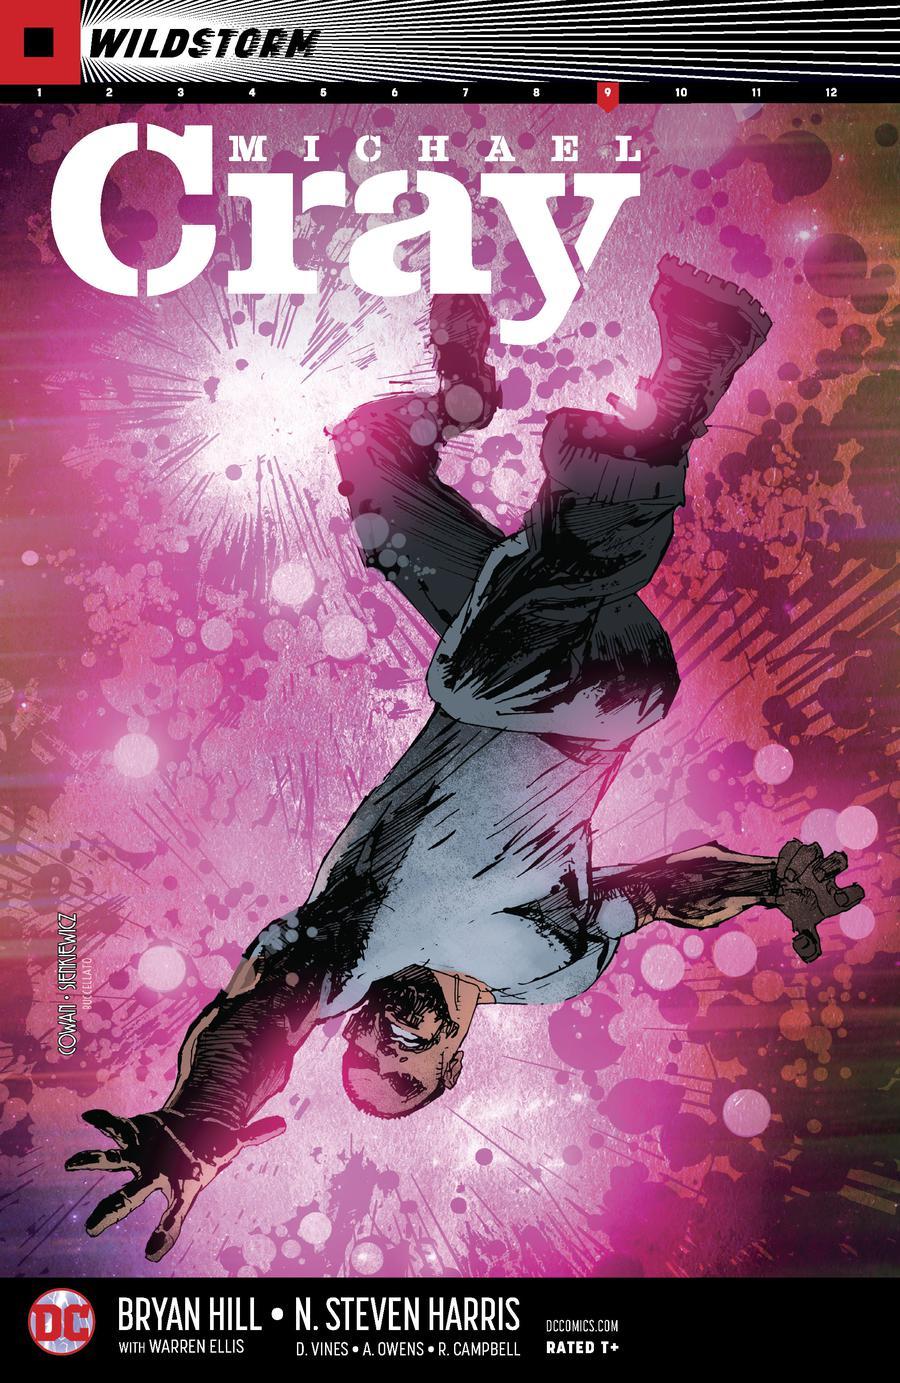 Wildstorm Michael Cray #9